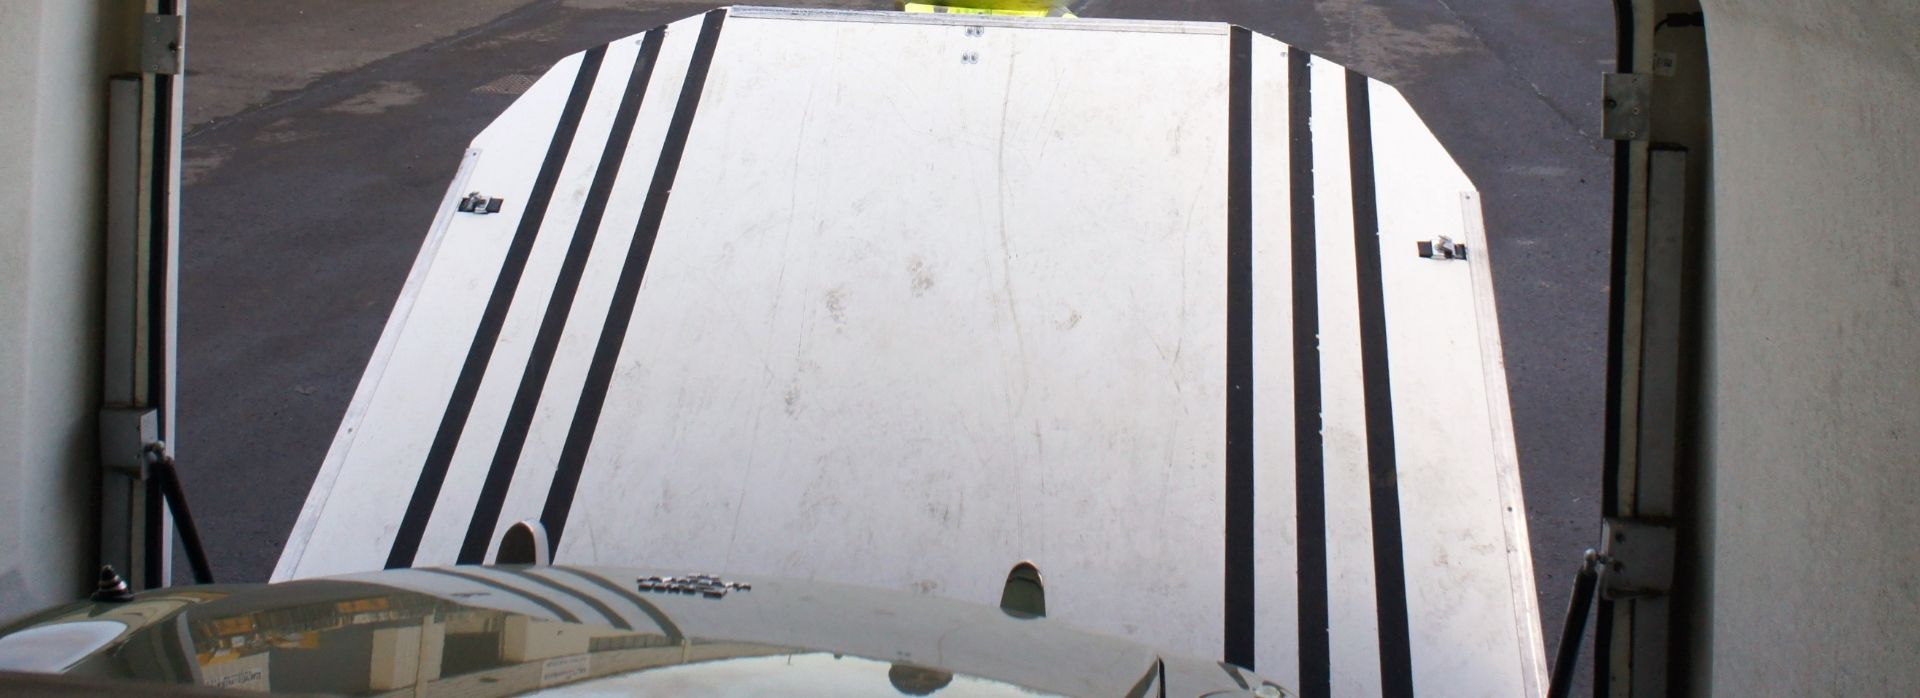 Lot 2 - * Eco-Trailer' Velocity RS Enclosed Twin Axle Car Trailer